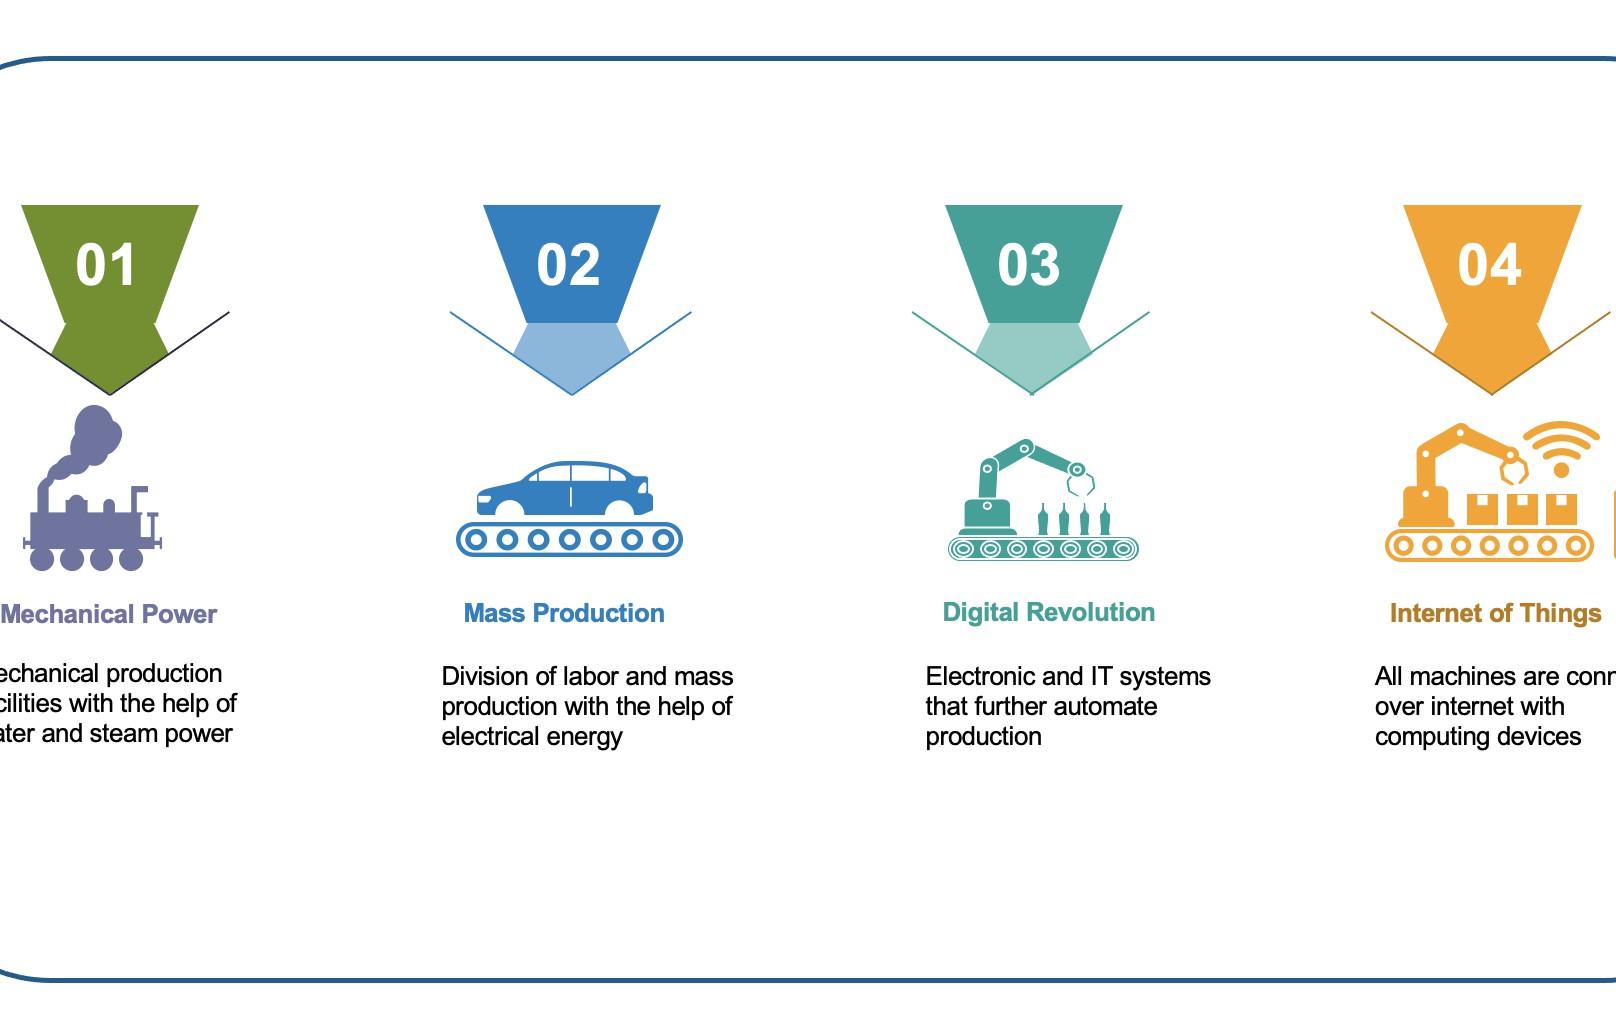 SAP Leonardo, IoT, and Industry 4.0